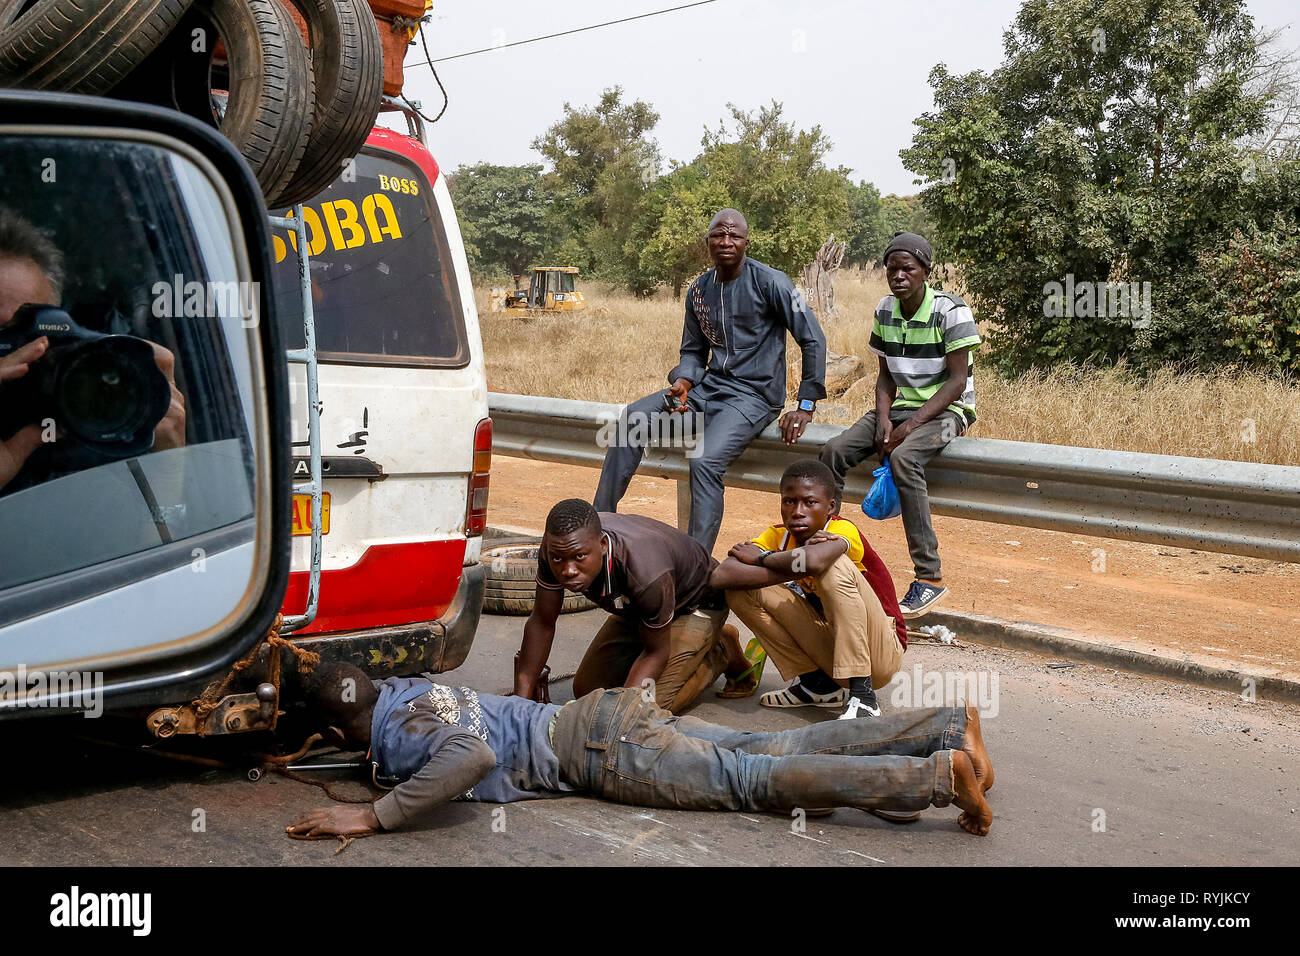 Les transports en minibus sur une ventilation Burkina Faso road. Photo Stock